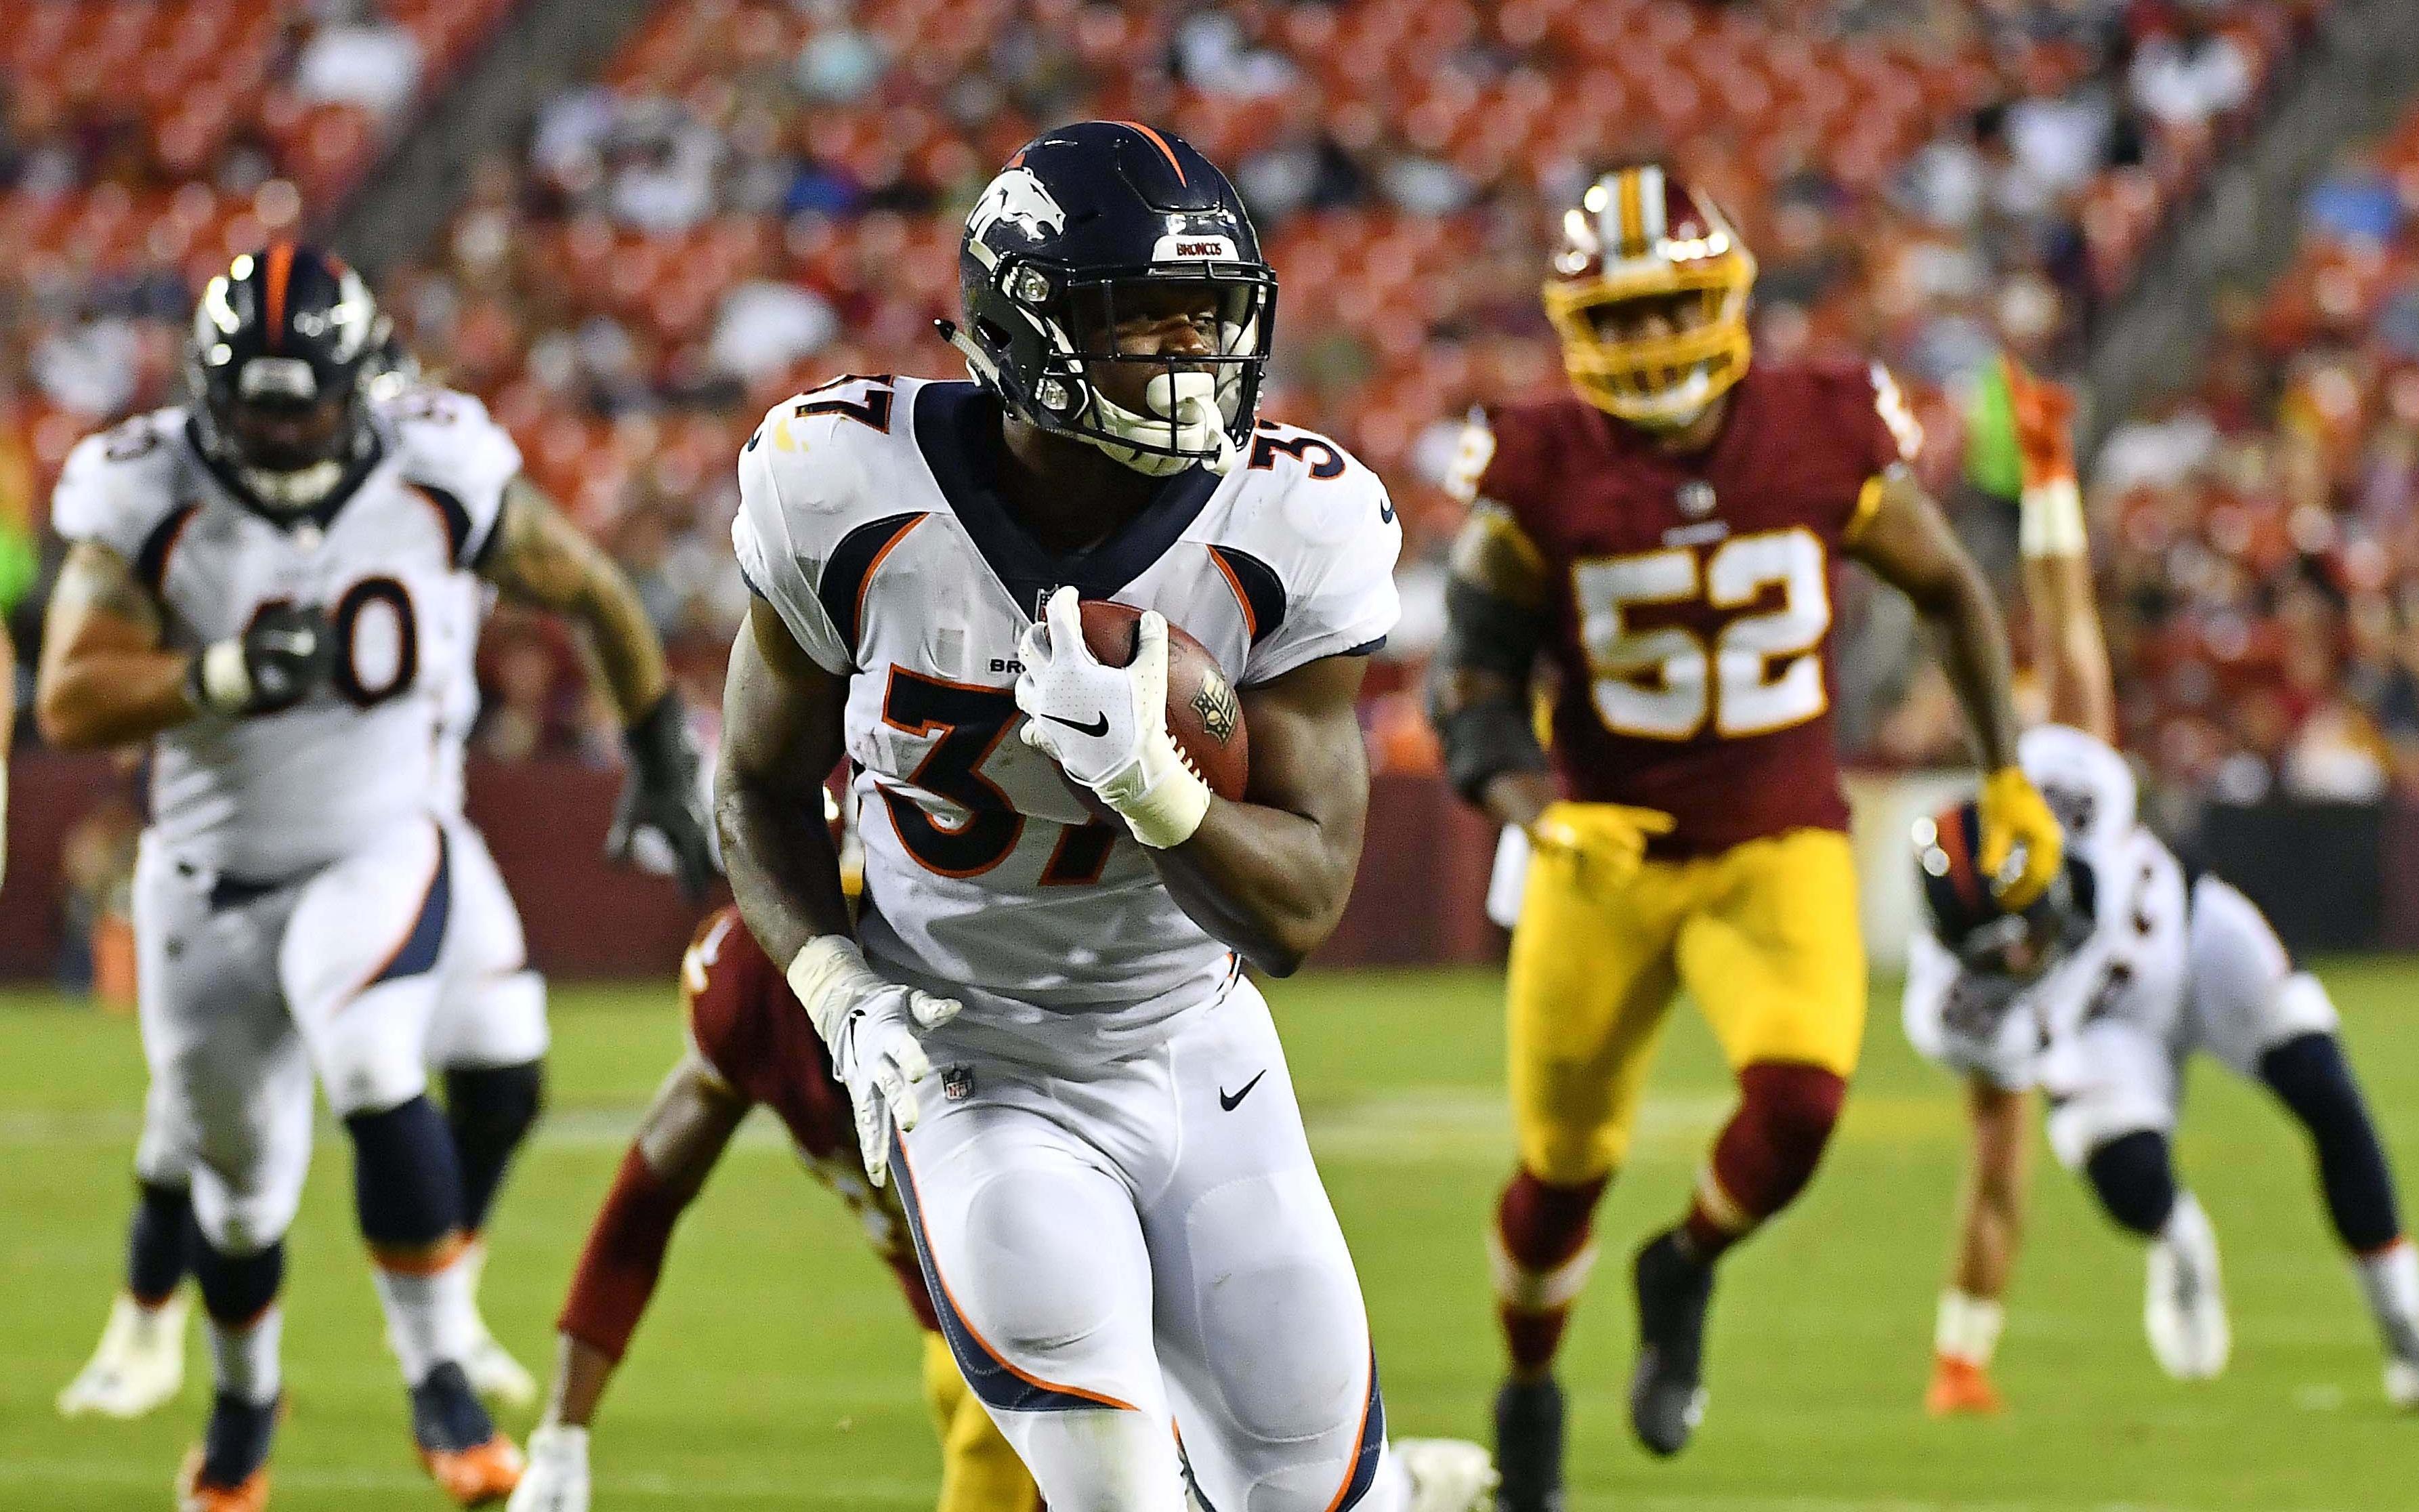 Royce Freeman runs for a touchdown against Washington. Credit: Brad Mills, USA TODAY Sports.